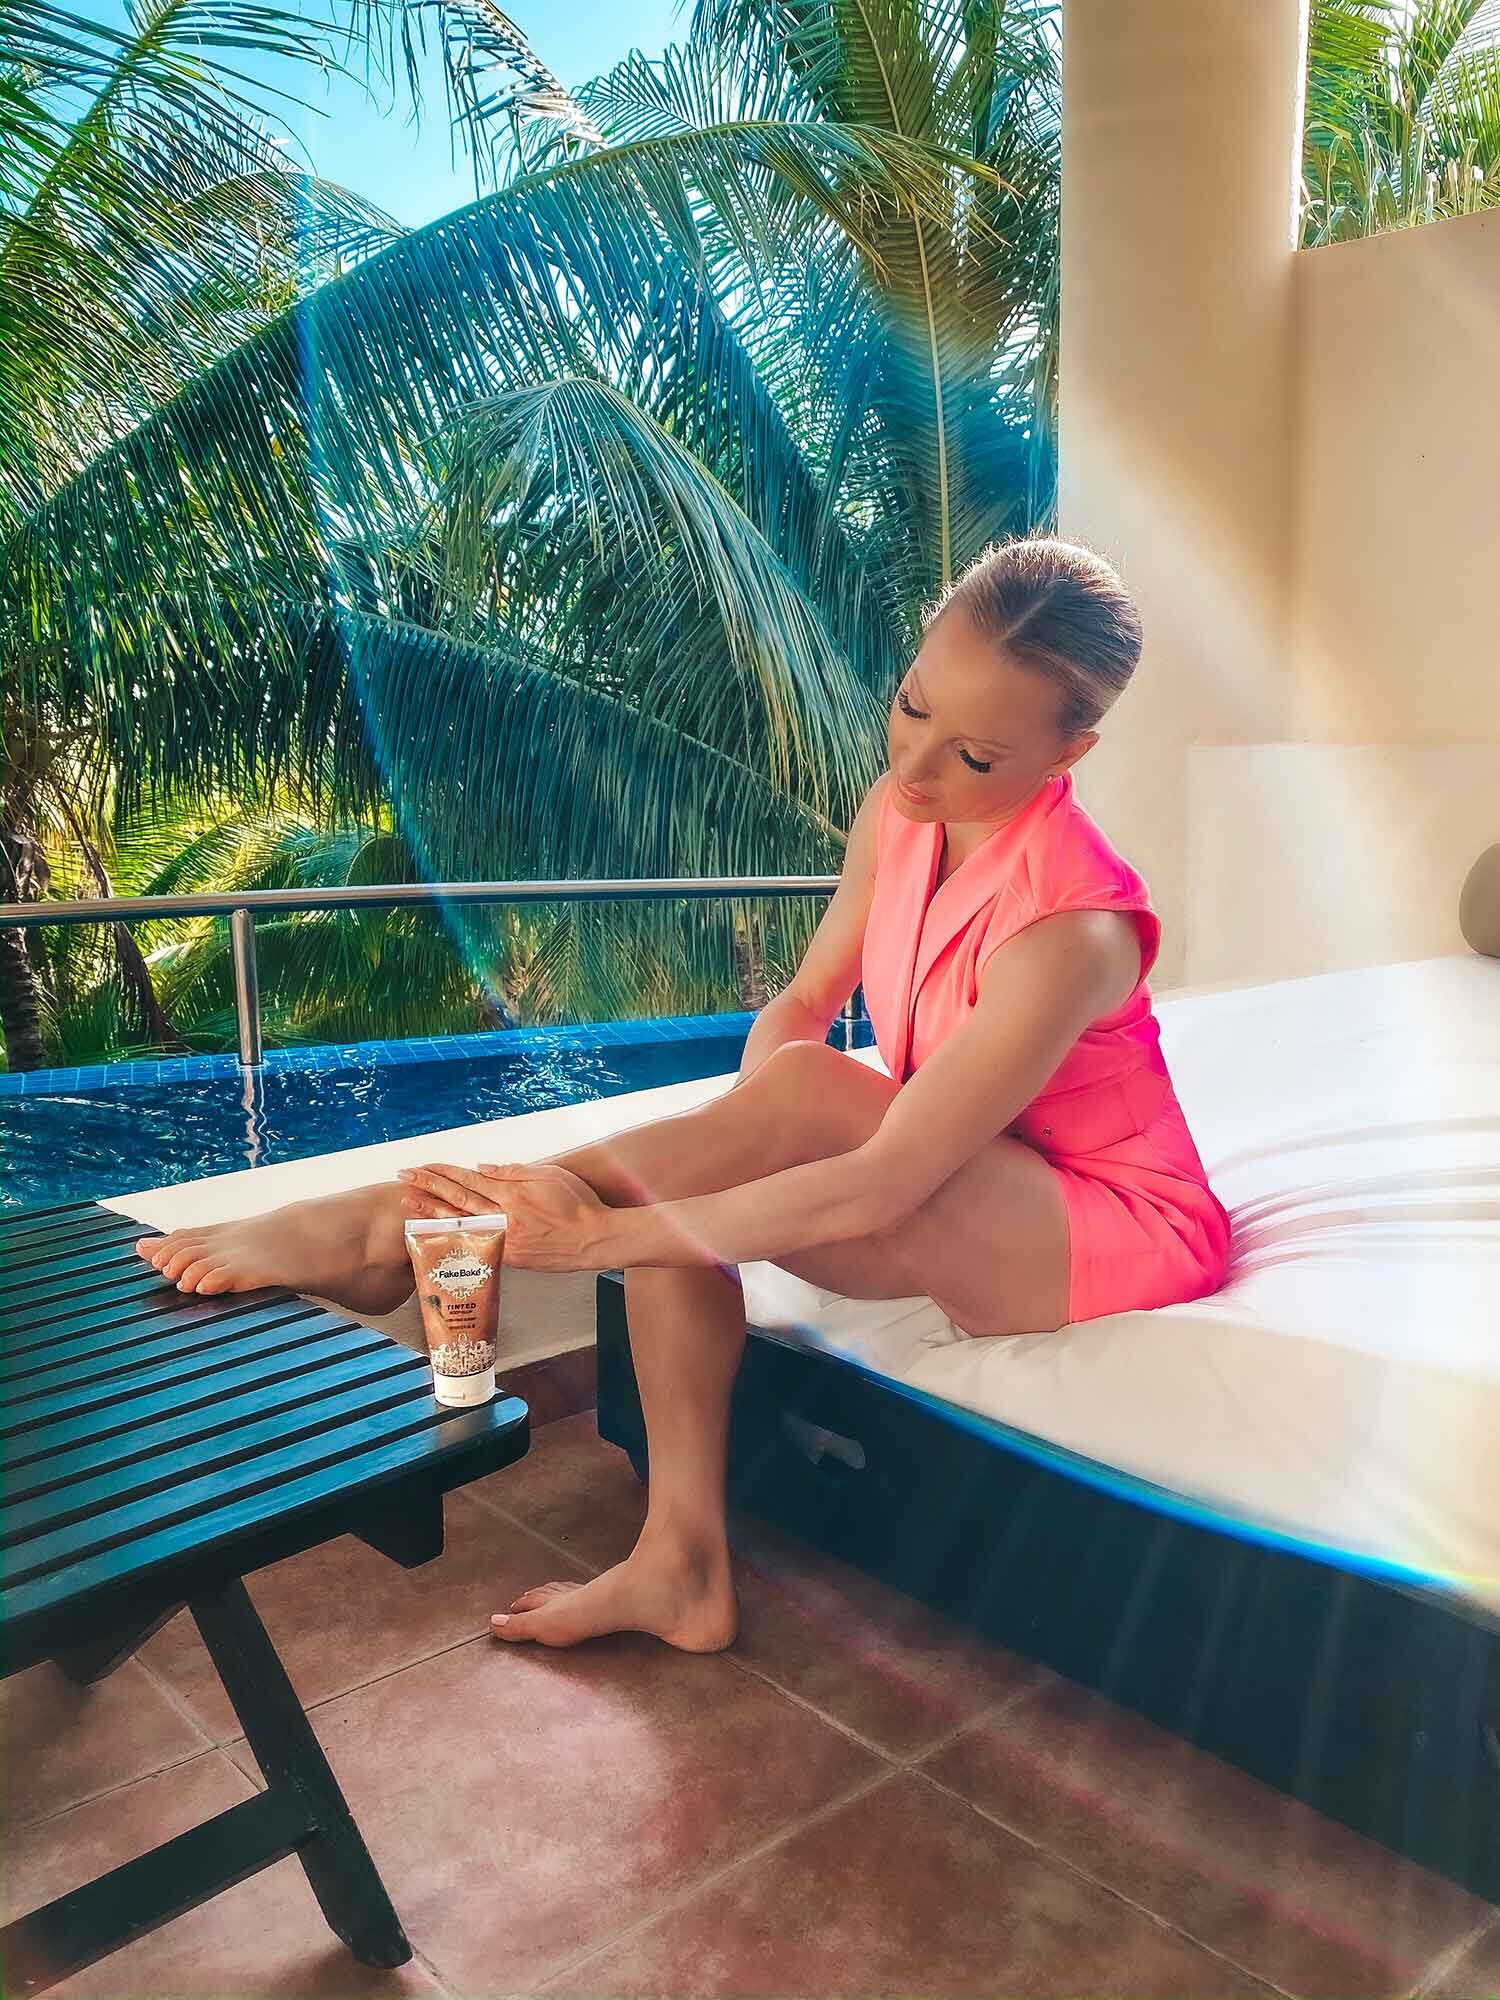 Model applying self tanner balcony El Dorada Maroma Mexico pink romper